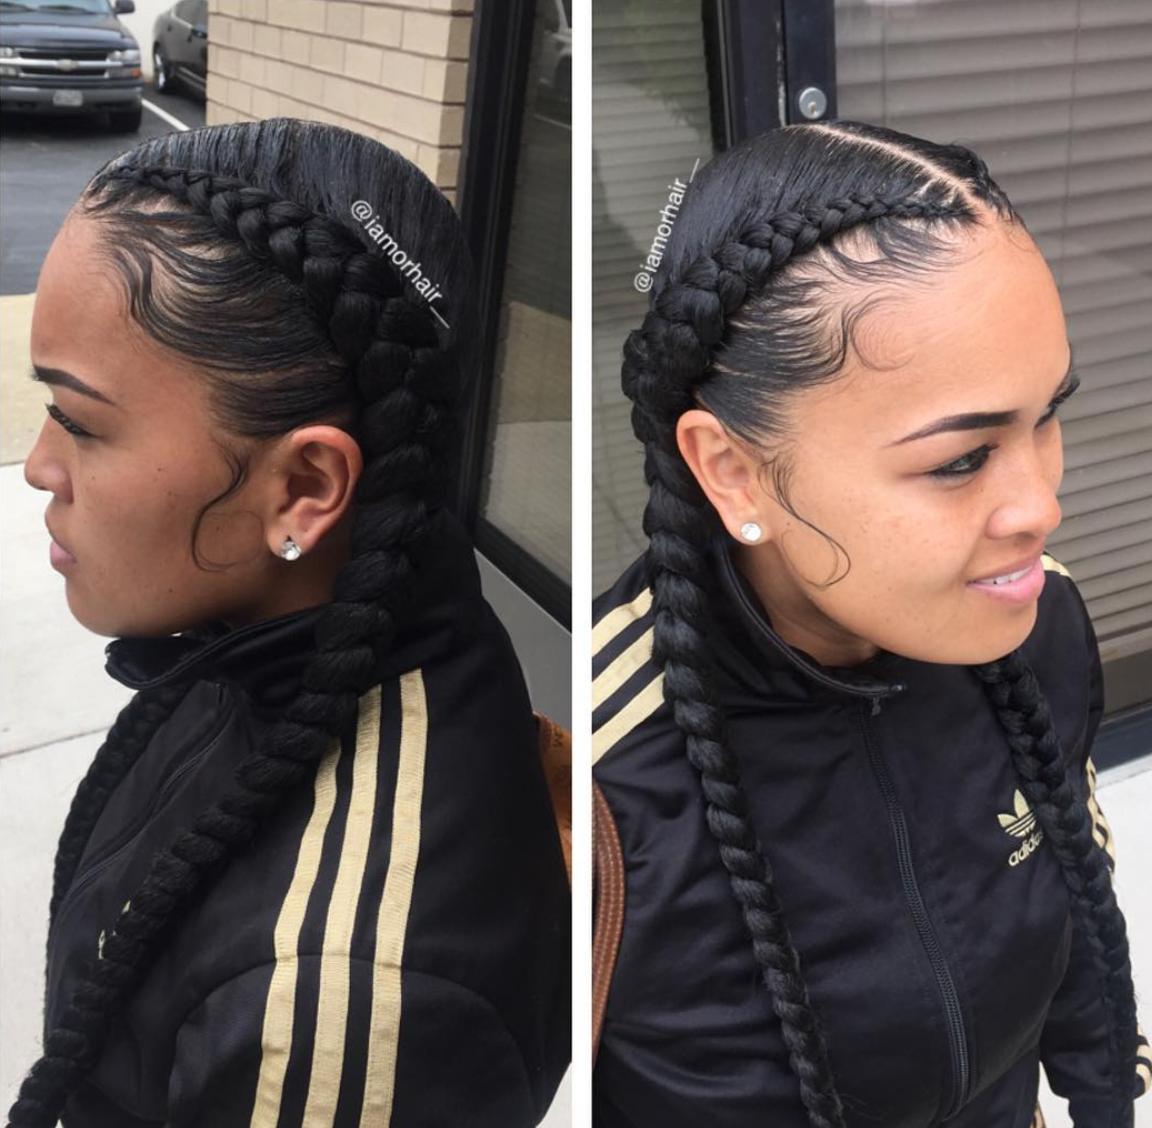 pin by black hair information - coils media ltd on braids